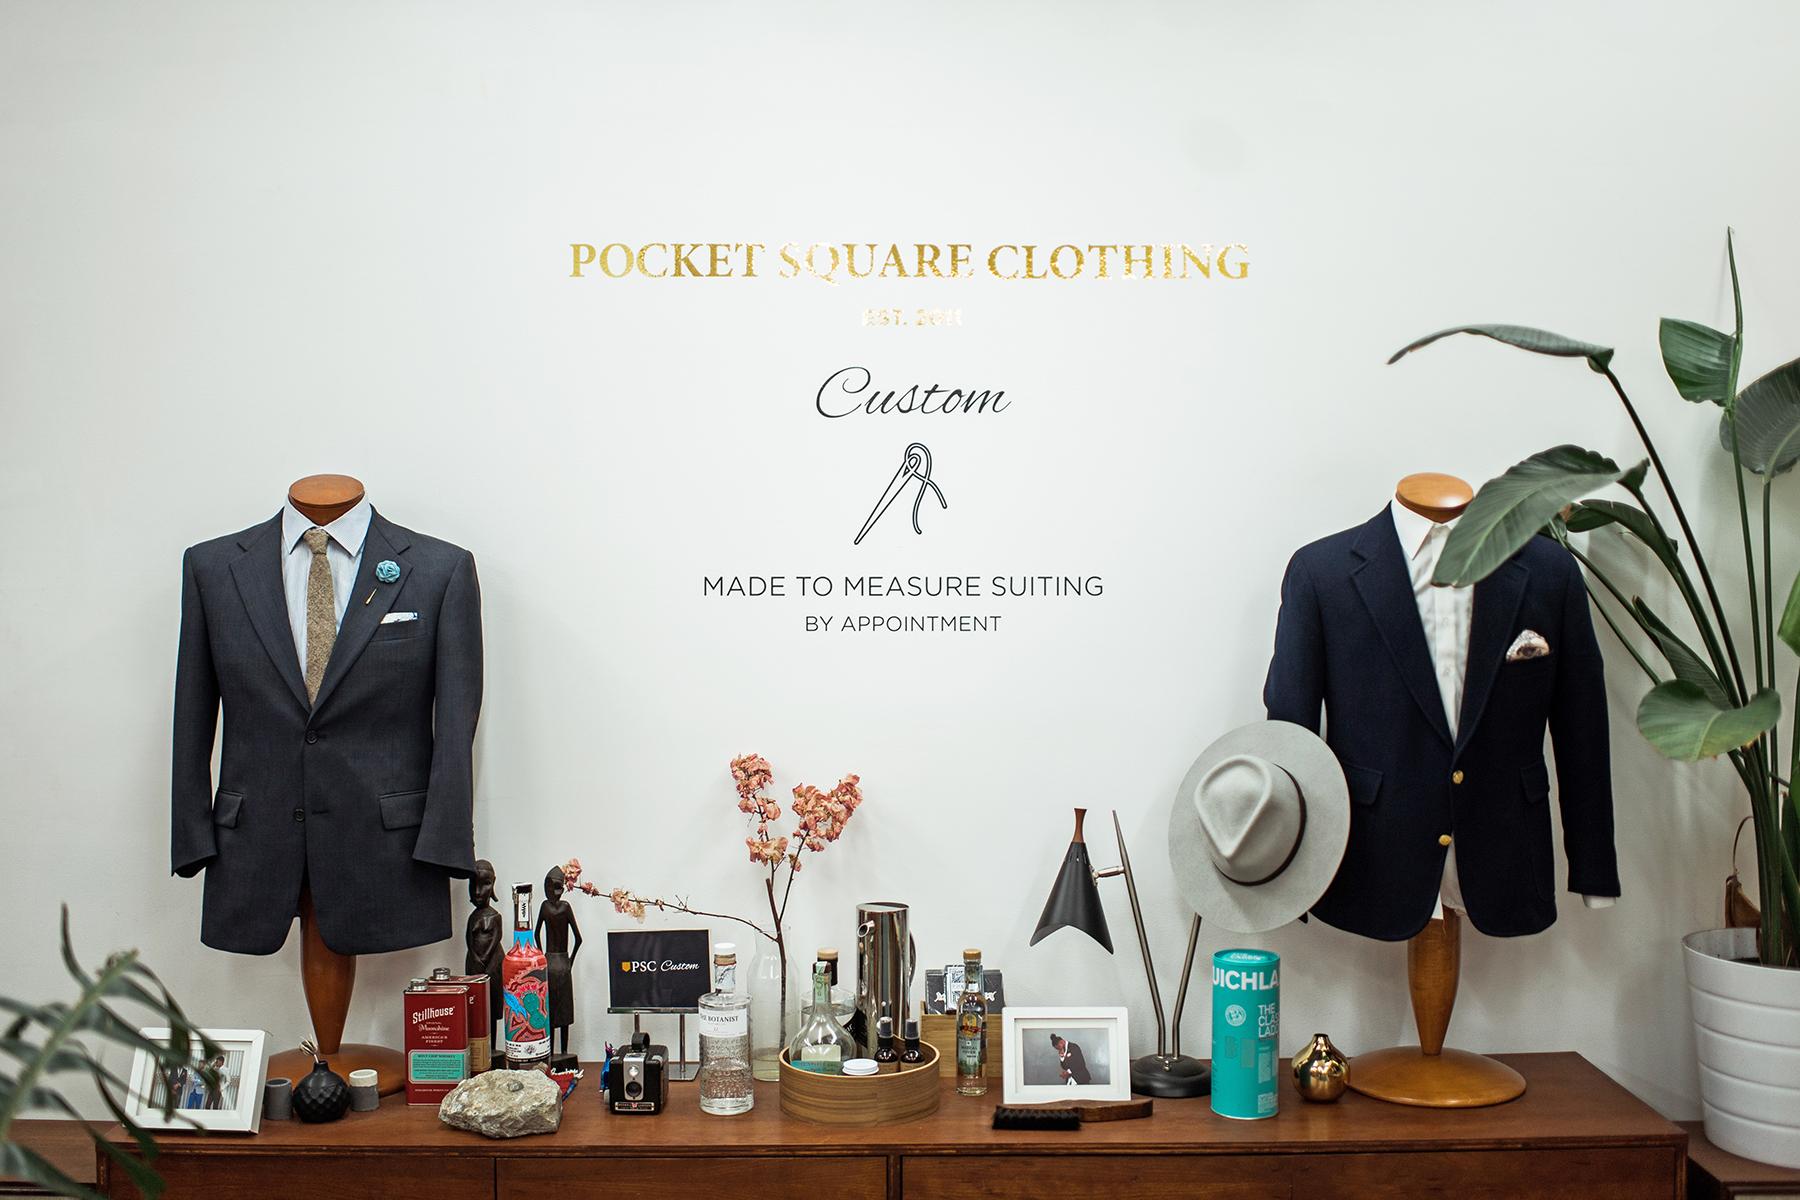 PSC - Los Angeles Custom Suit, Clothing, Suit Accessories Store